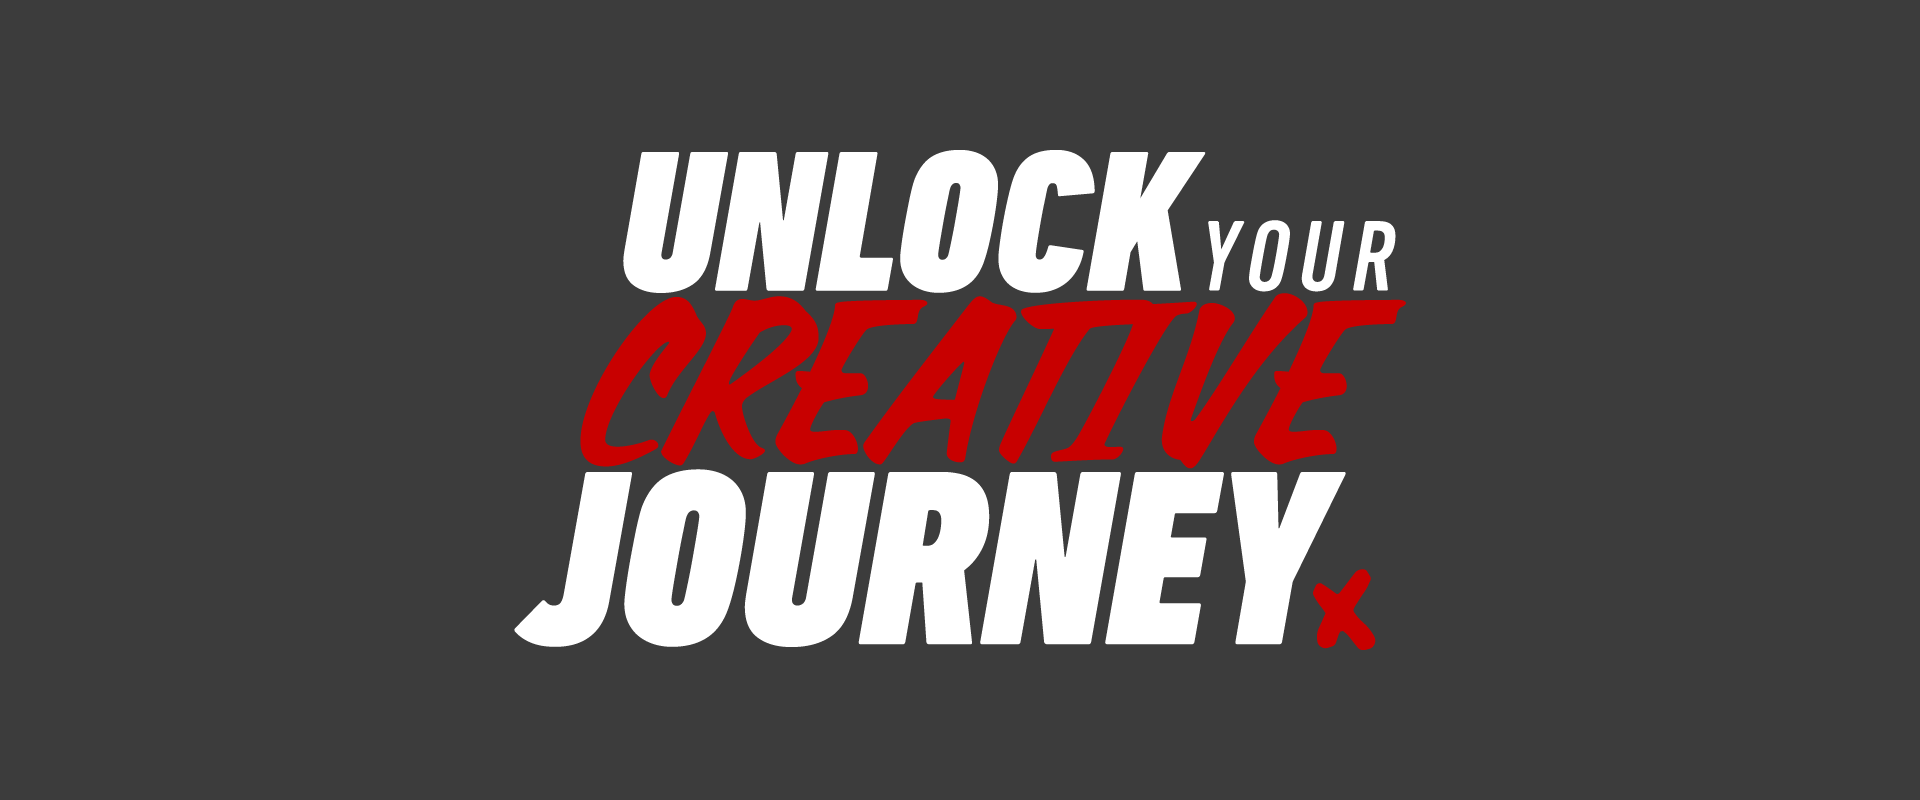 Unlock Your Creative Journey